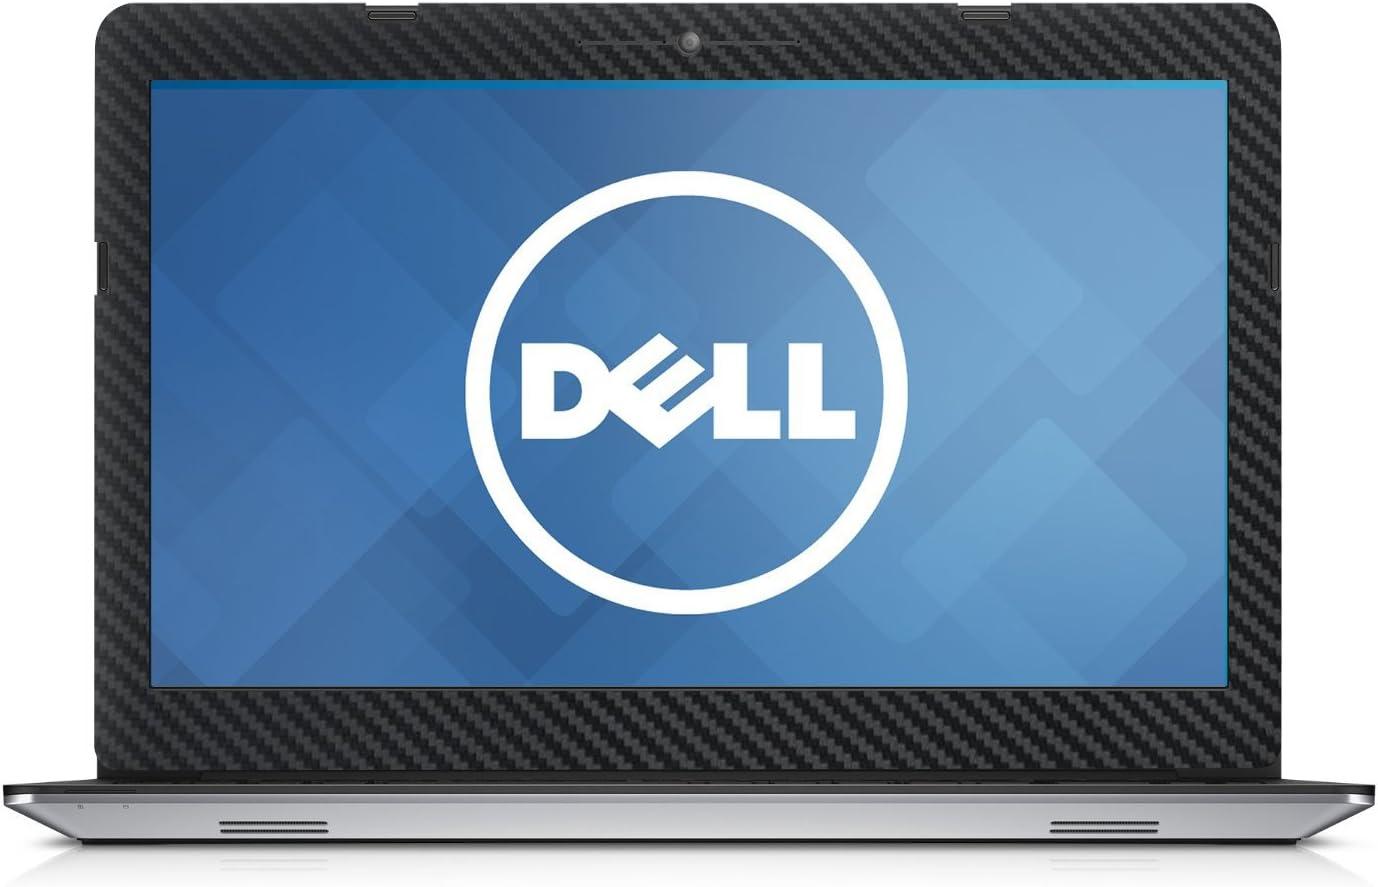 "Black Carbon Fiber skin decal wrap skin Case for Dell Inspiron 15 5555 5558 5559 15.6"" Laptop"